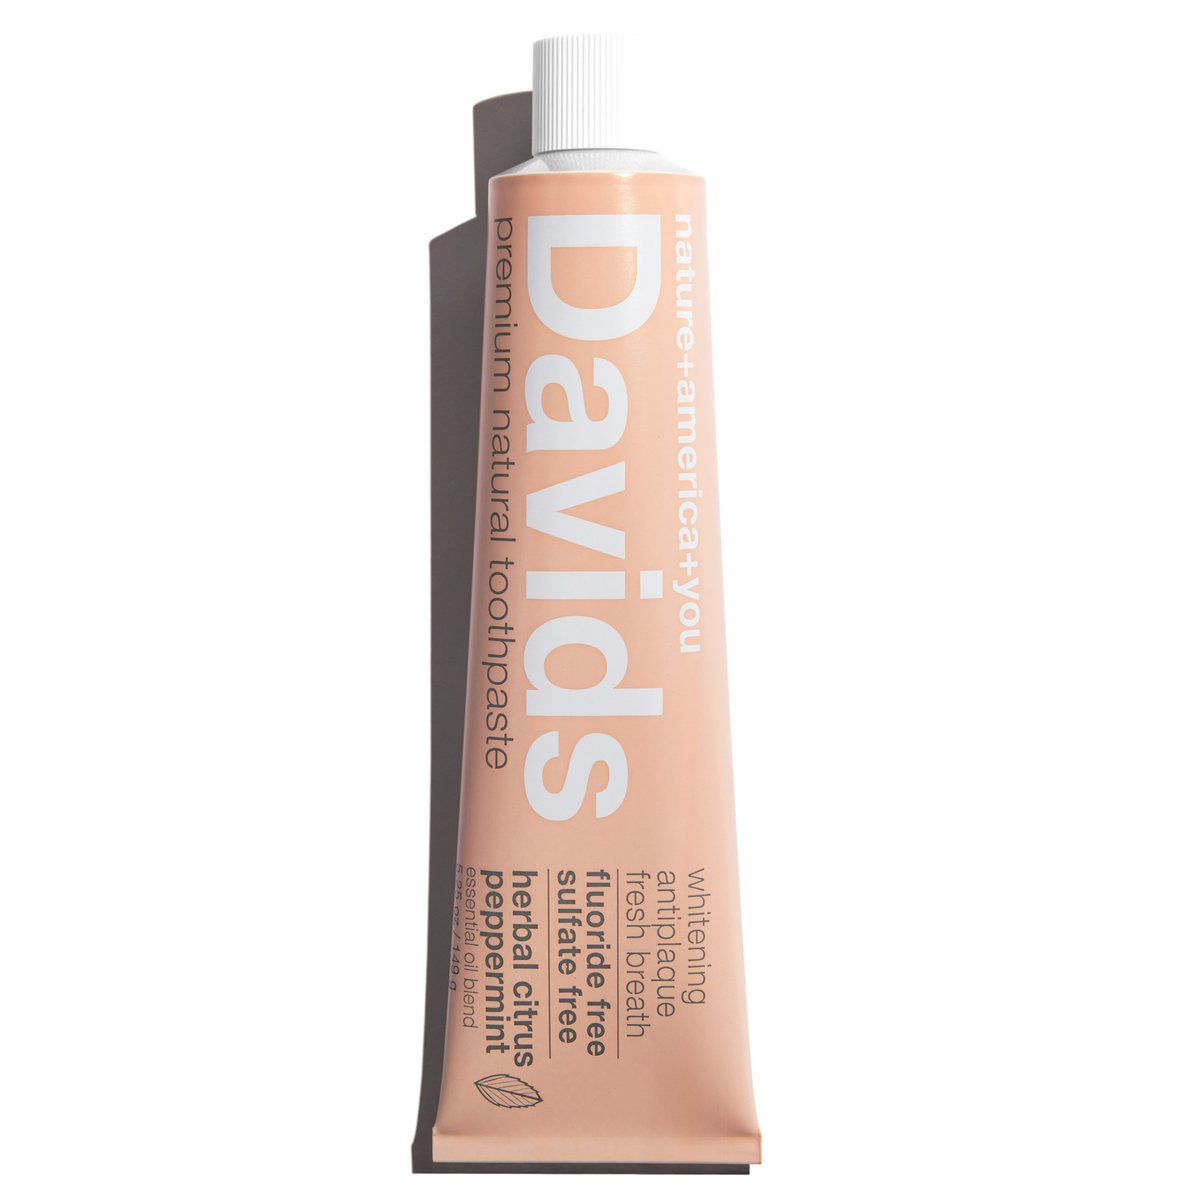 Davids Herbal Citrus Peppermint Toothpaste